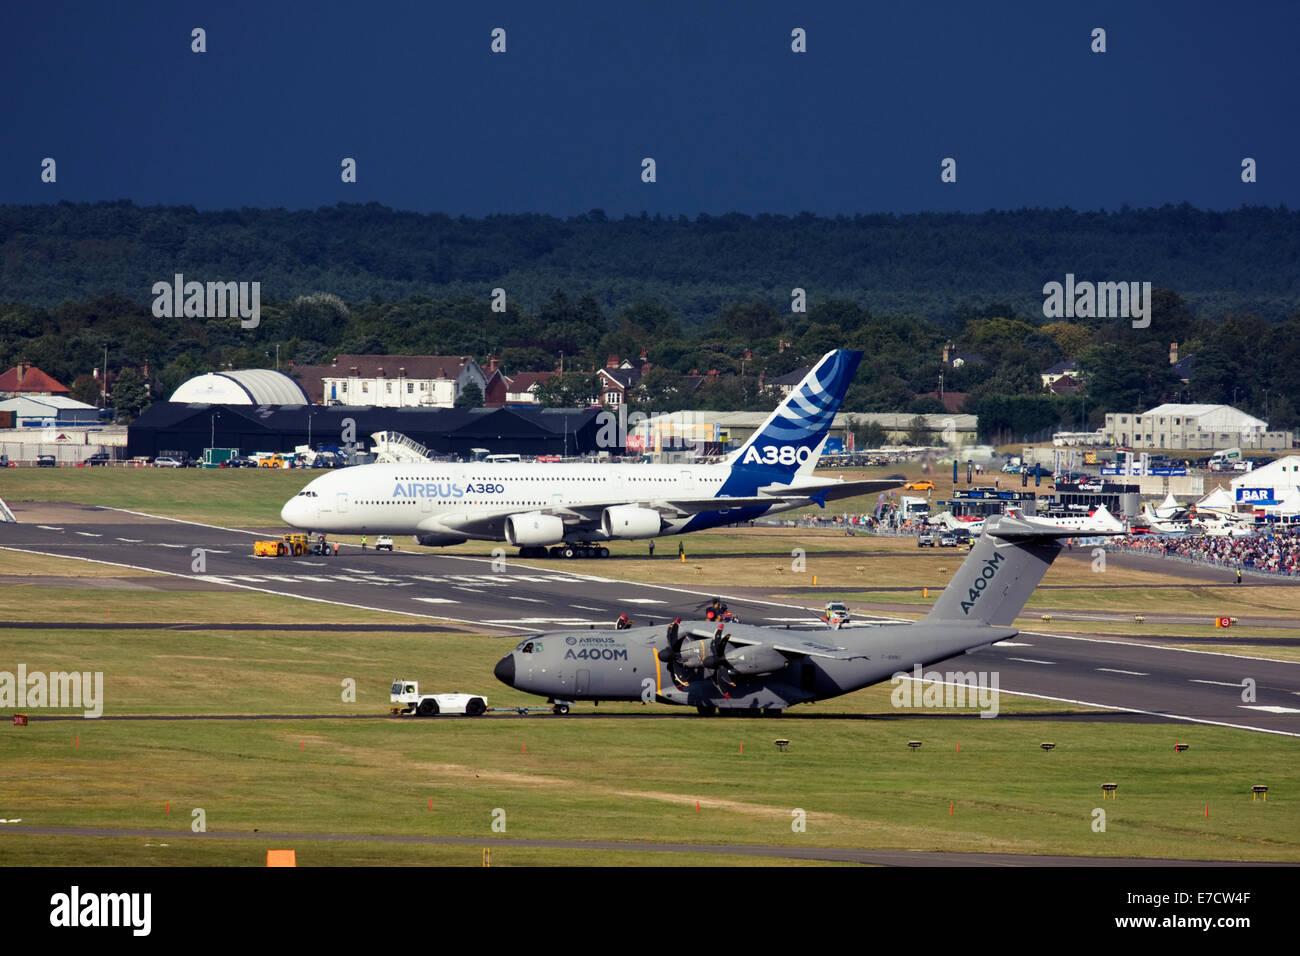 Airbus A380-841 and Airbus A400M Atlas at Farnborough International Airshow 2014 - Stock Image